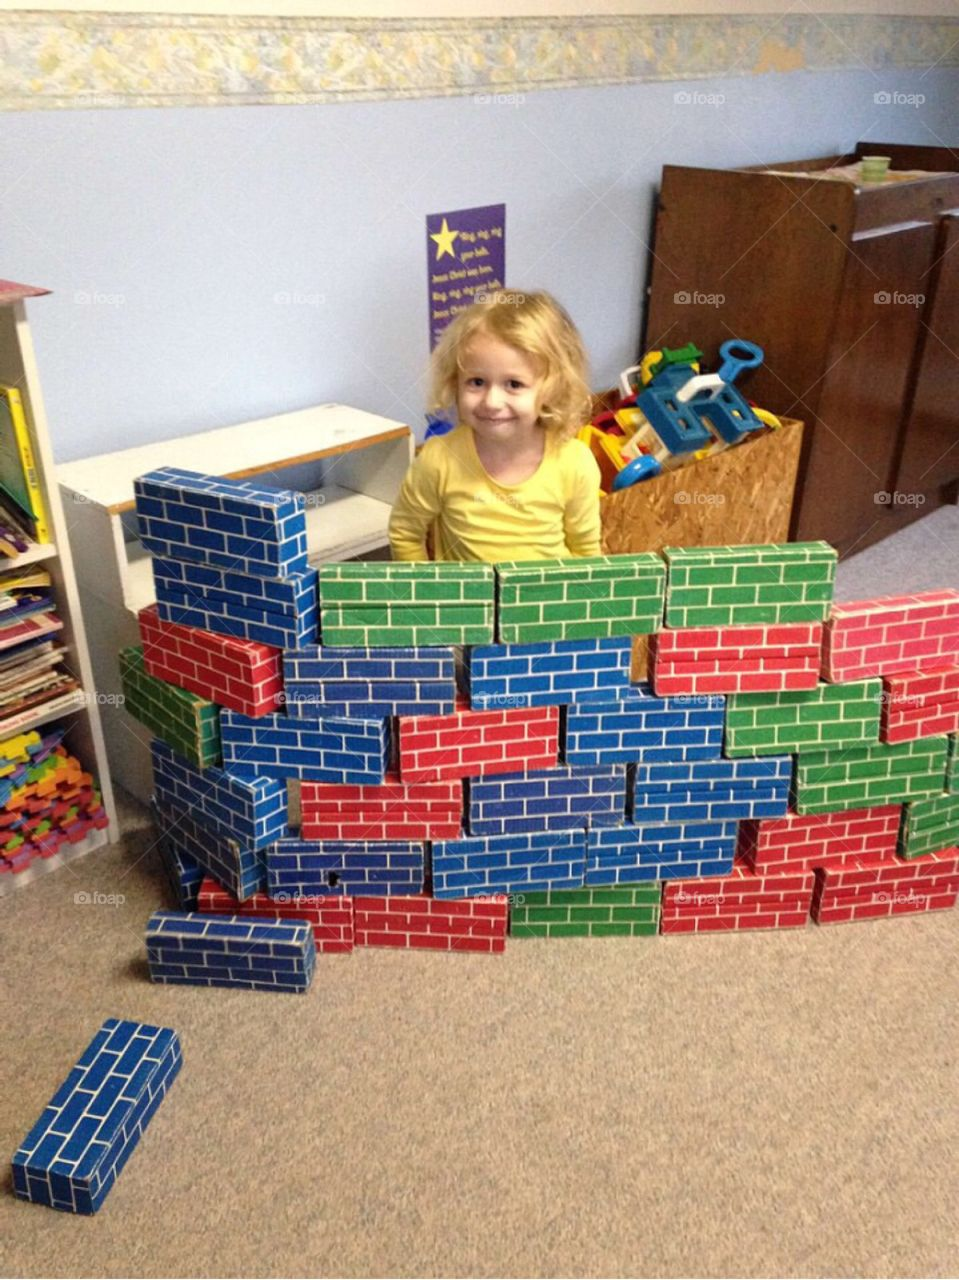 Trump said I had to build this wall! 😂